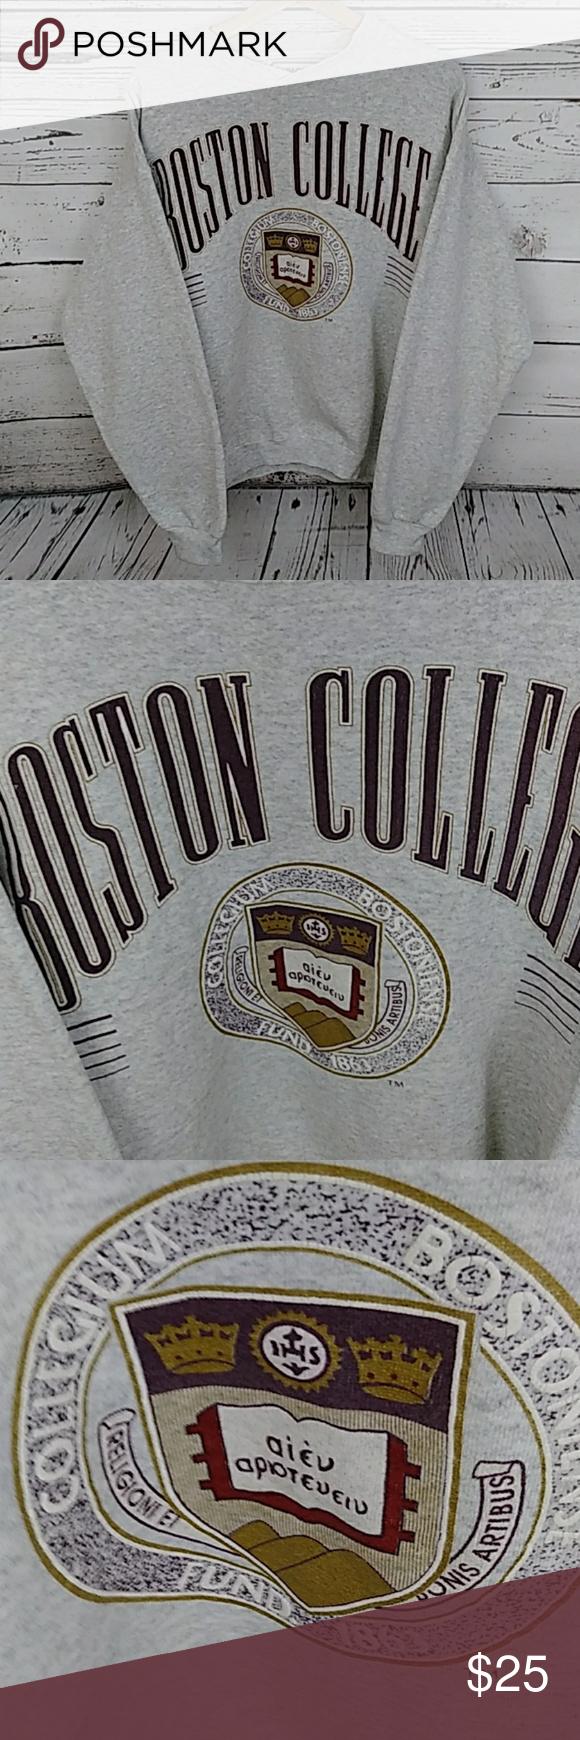 Vintage Boston College Sweatshirt College Sweatshirt Sweatshirts Vintage Sweatshirt [ 1740 x 580 Pixel ]